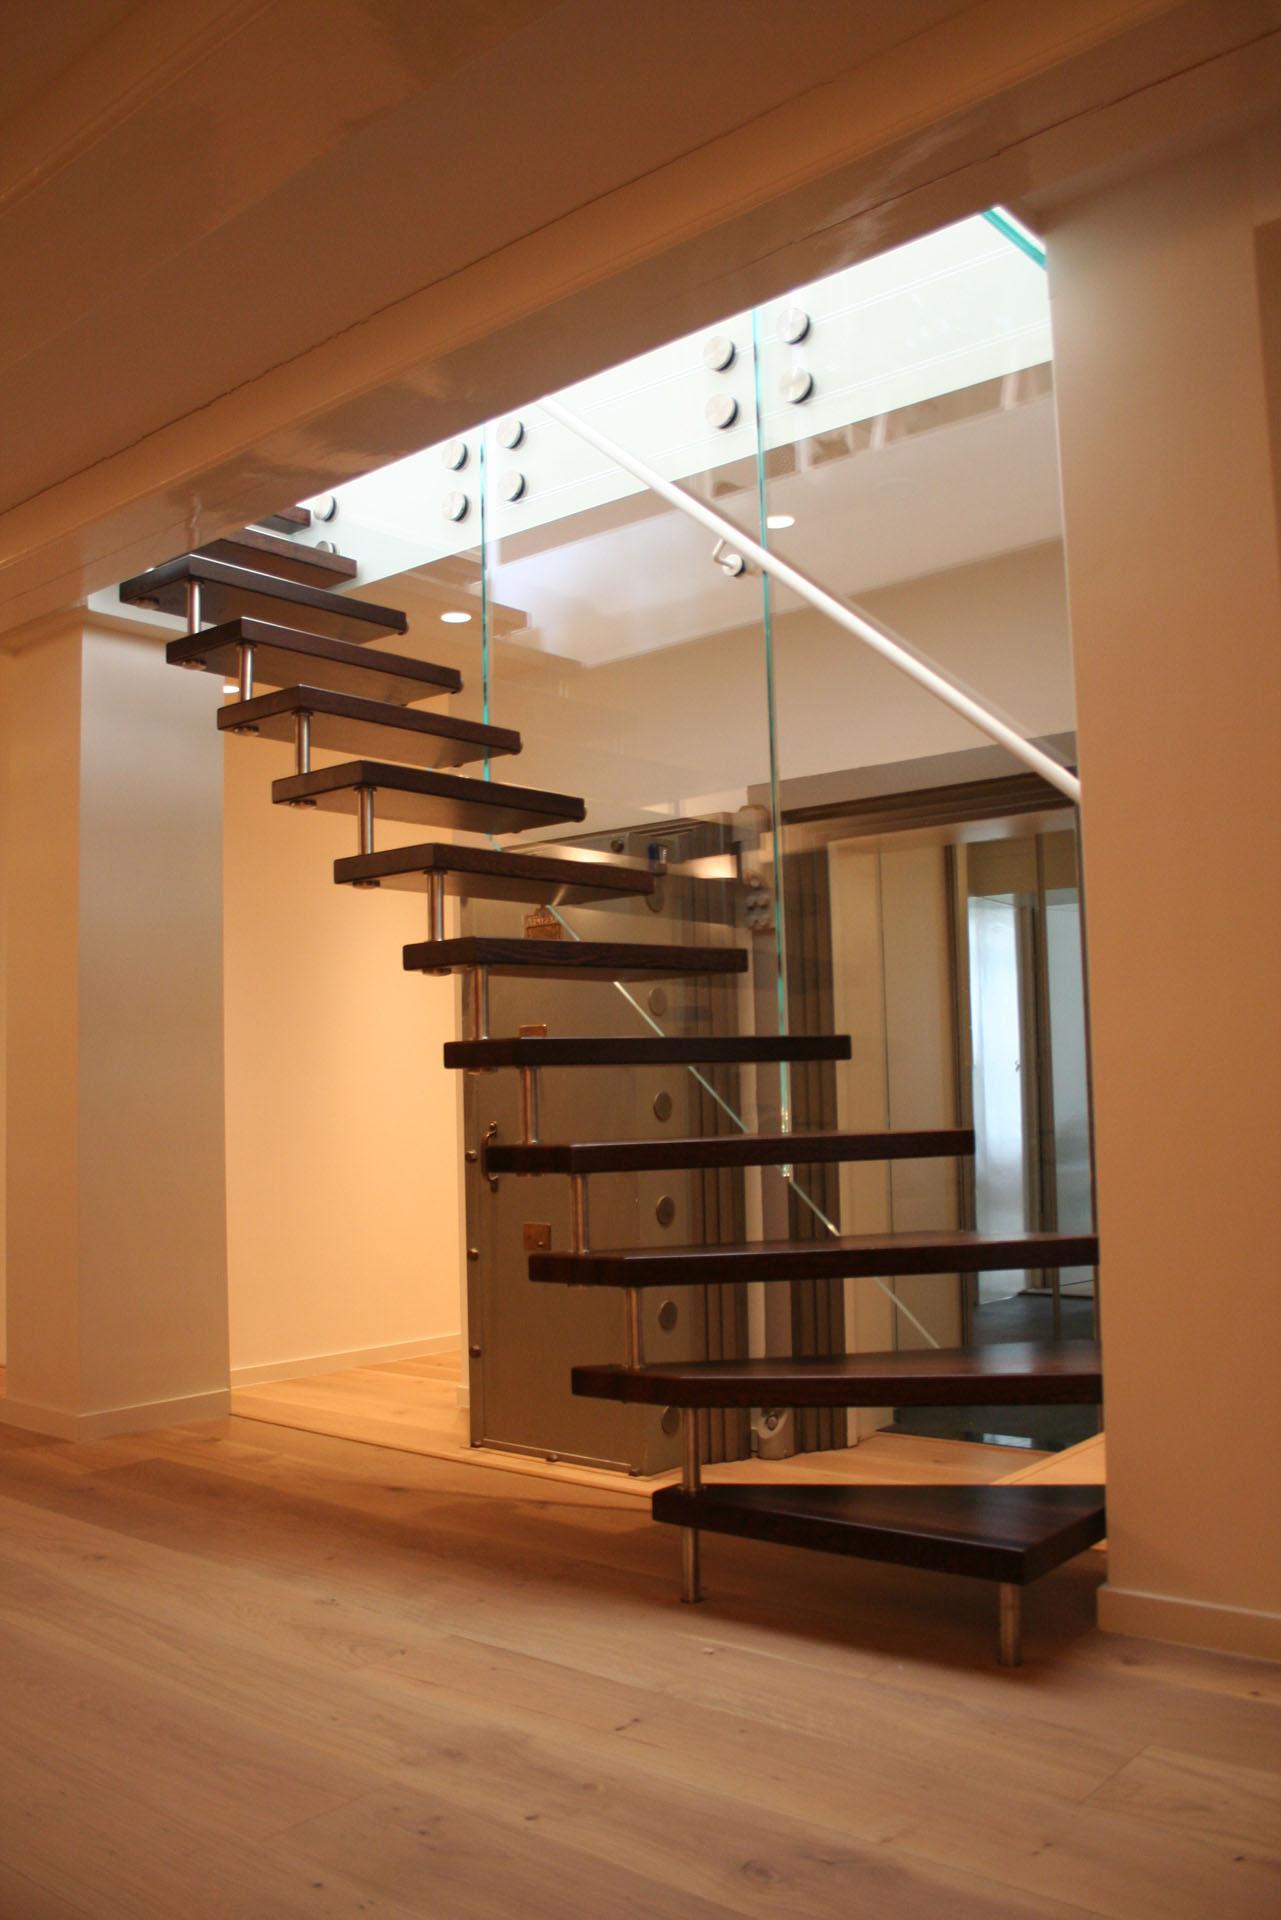 Semi zwevende weng houten kwartslagtrap hangend aan een glazen paneel allstairs trappen - Moderne trap kwartslag ...